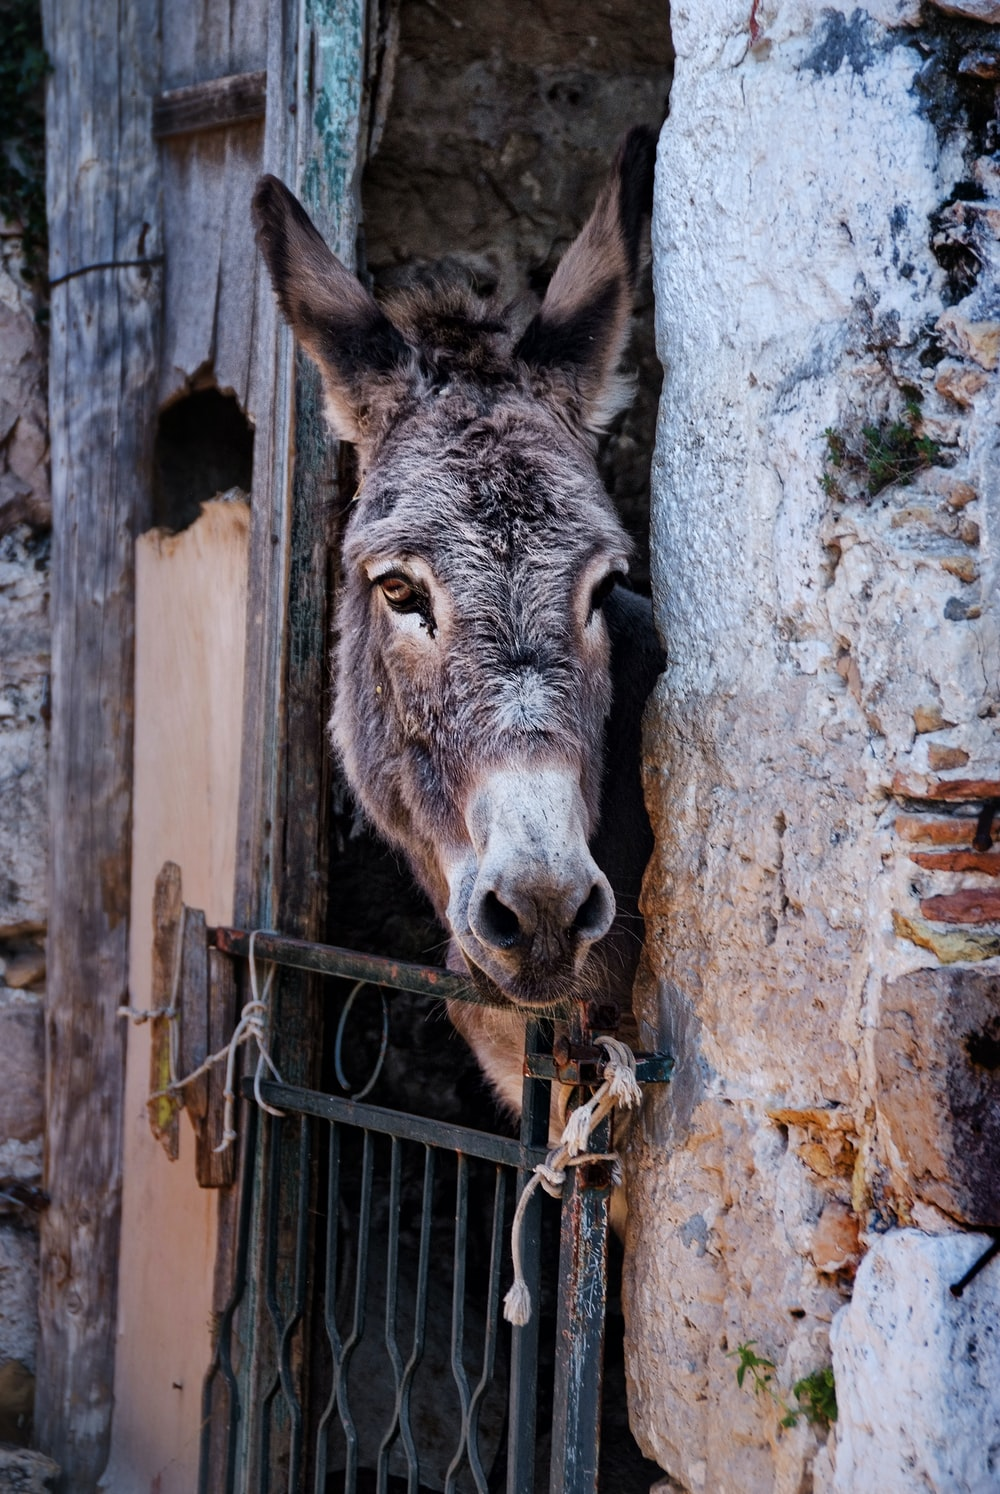 gray donkey inside gray concrete cage